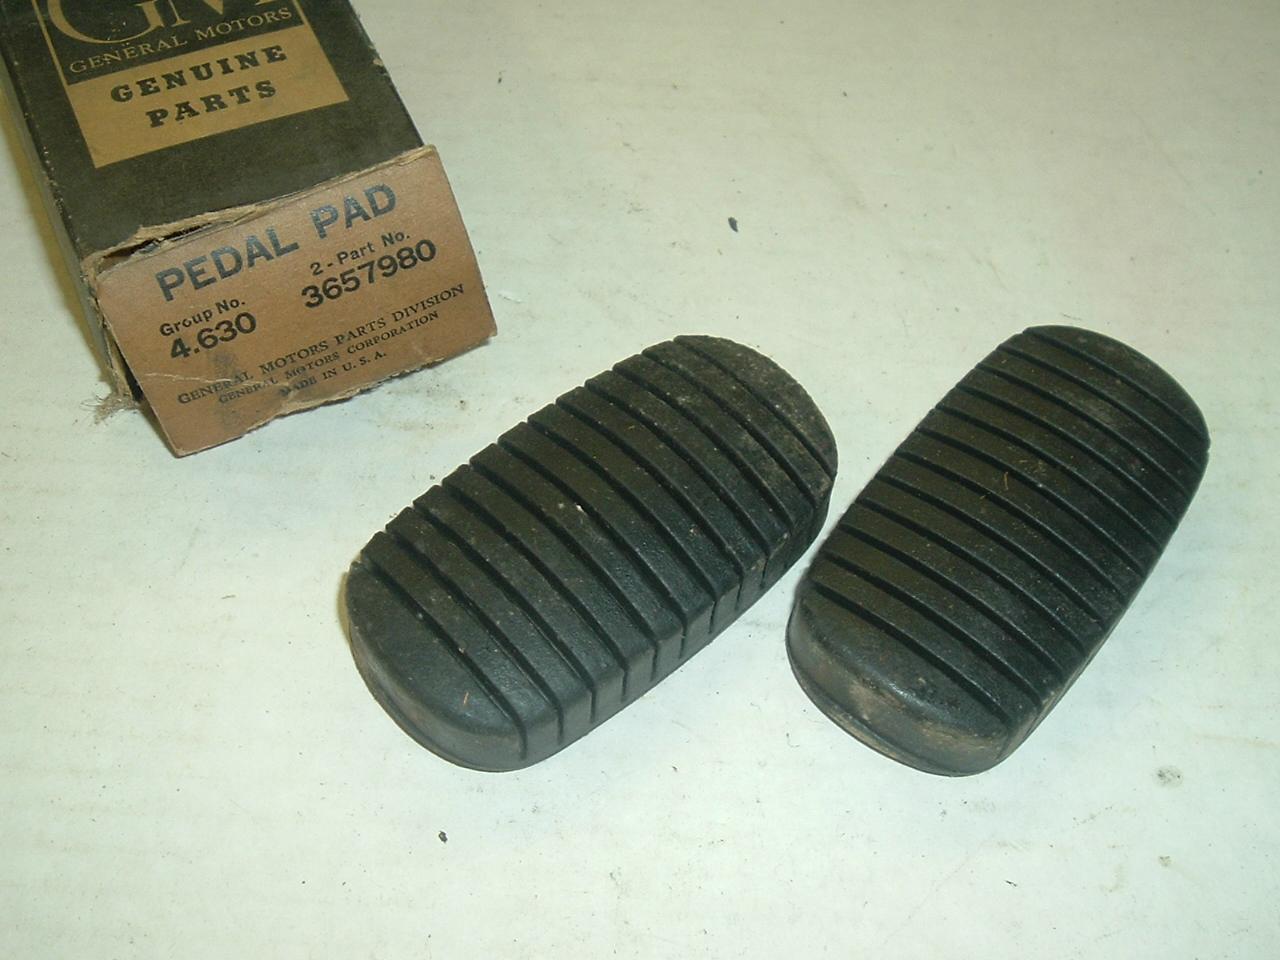 1955 56 57 Chevrolet & corvette pedal pads nos 3657980 (a 3657980)